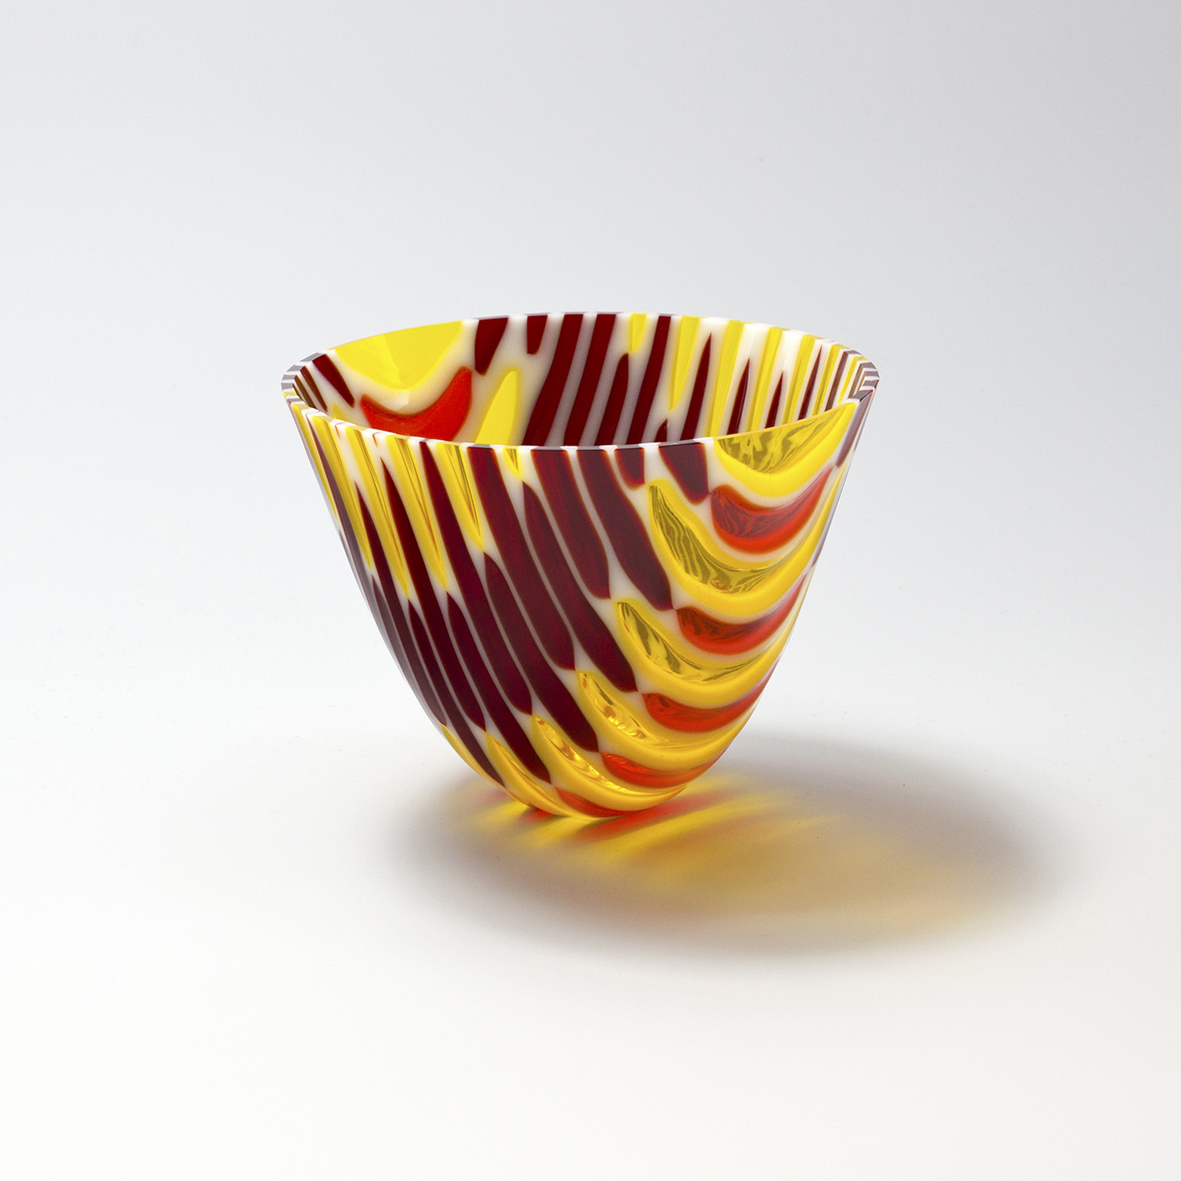 Vortex Vessel I in red, orange and yellow